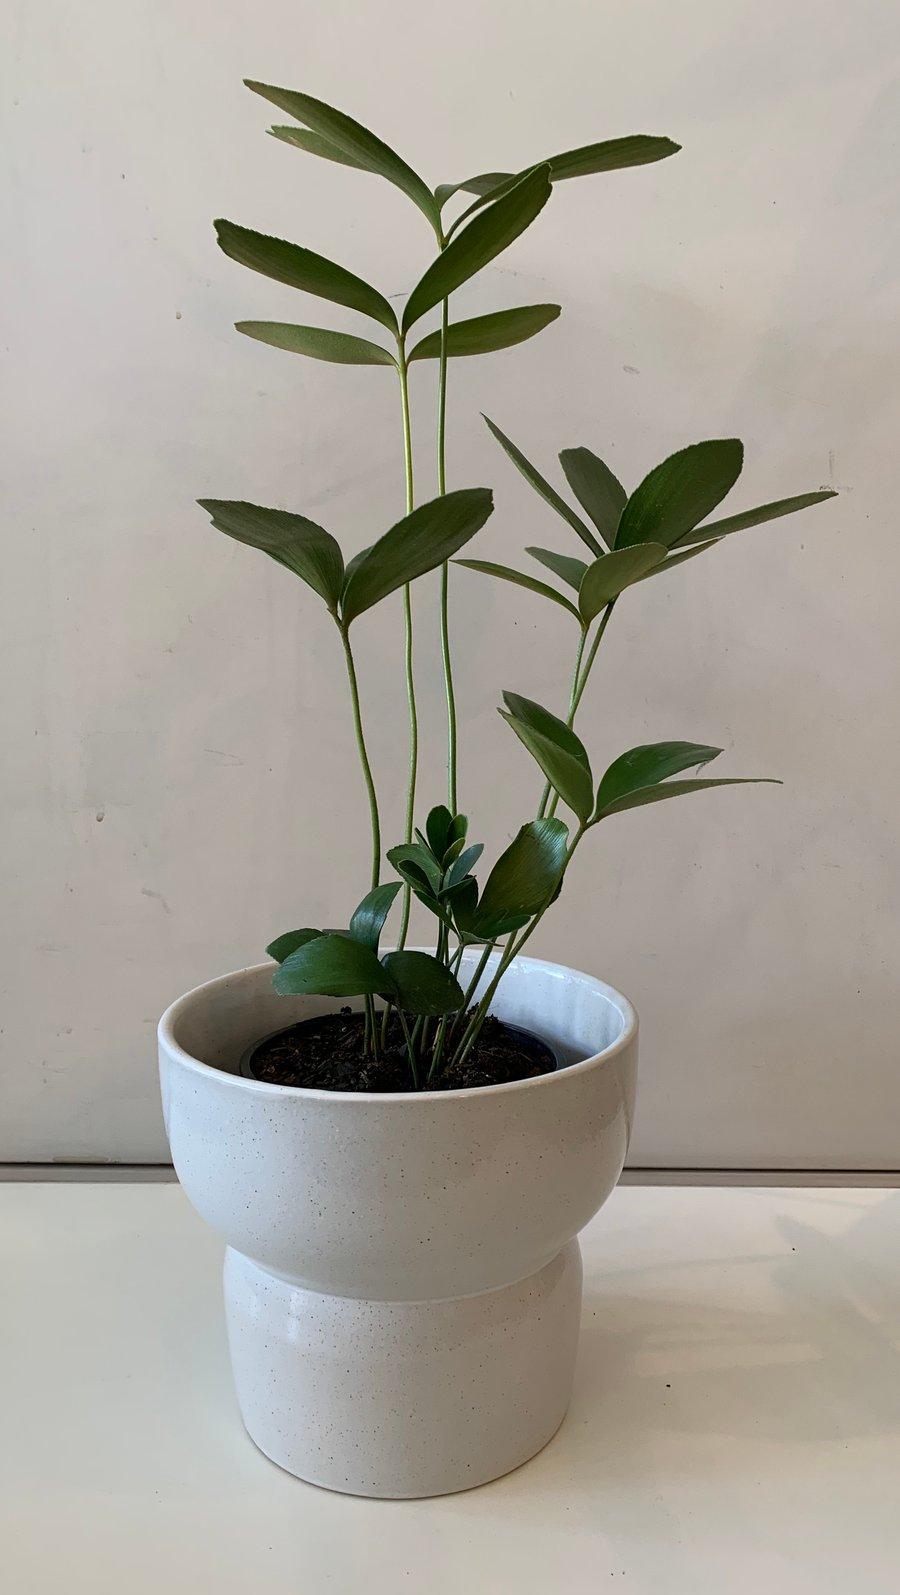 Image of Luna pot